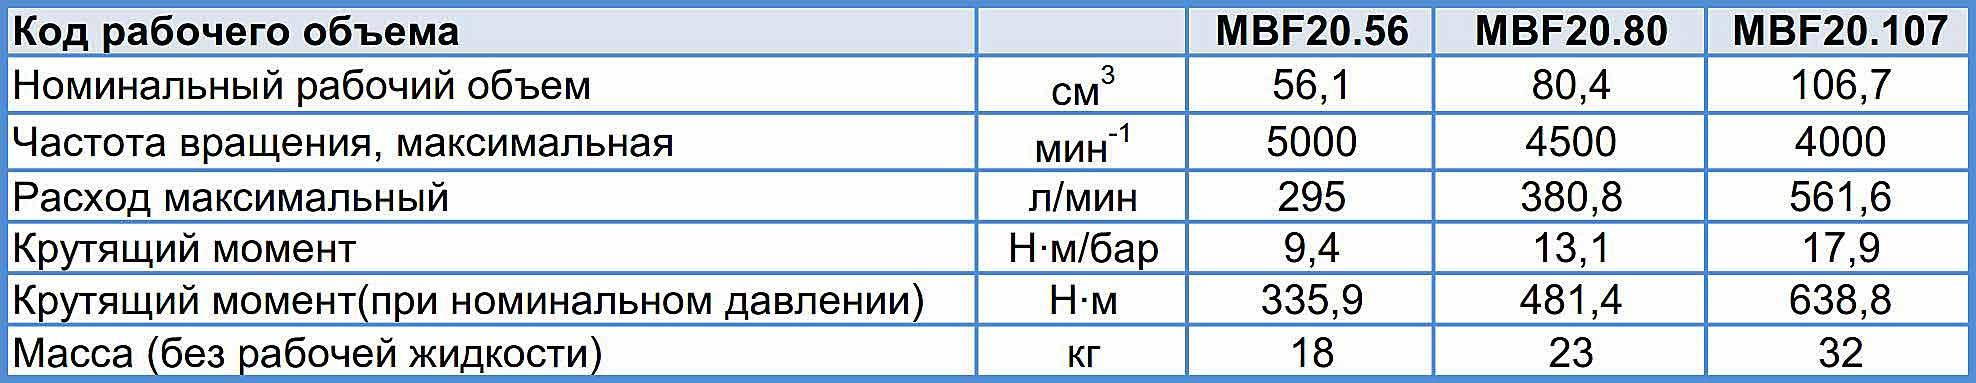 http://www.hydrosila.com/files/content/Image/APM_2014/1111/MBF20_ru.jpg